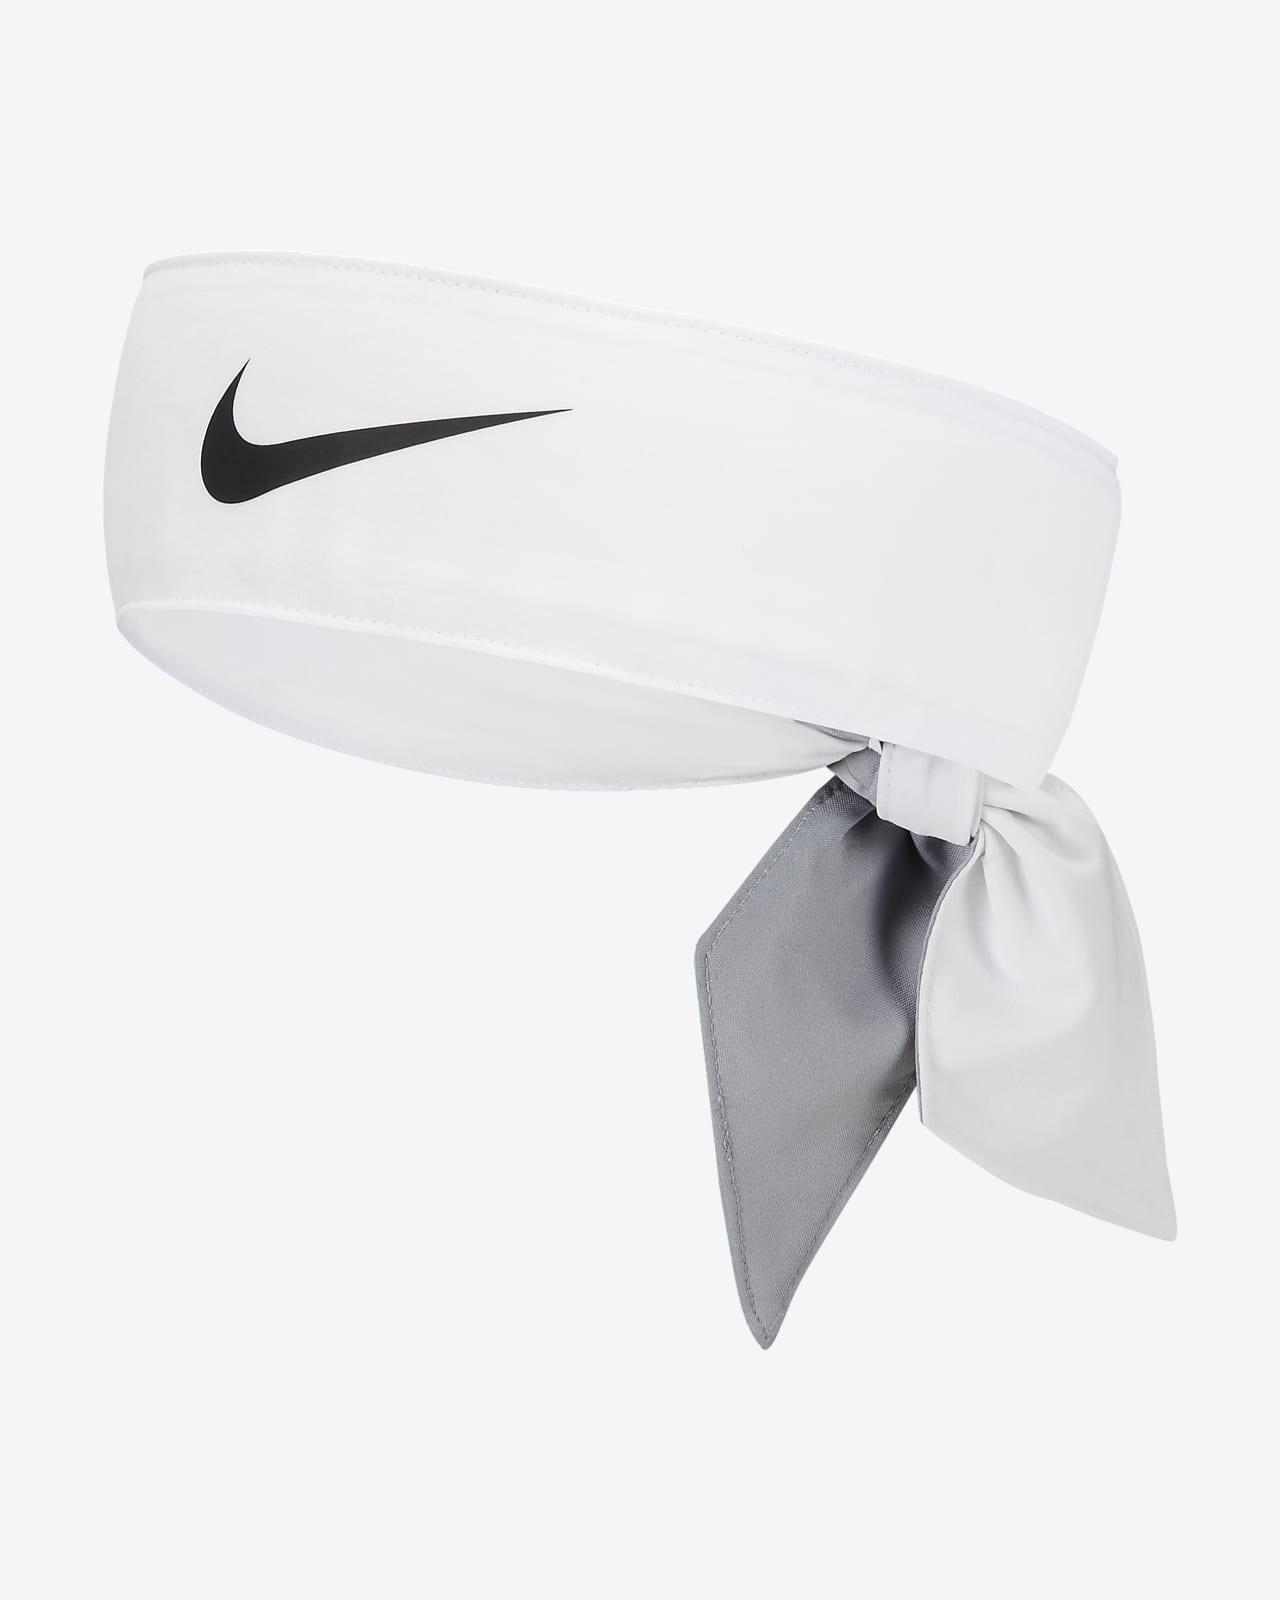 Tennispannband NikeCourt